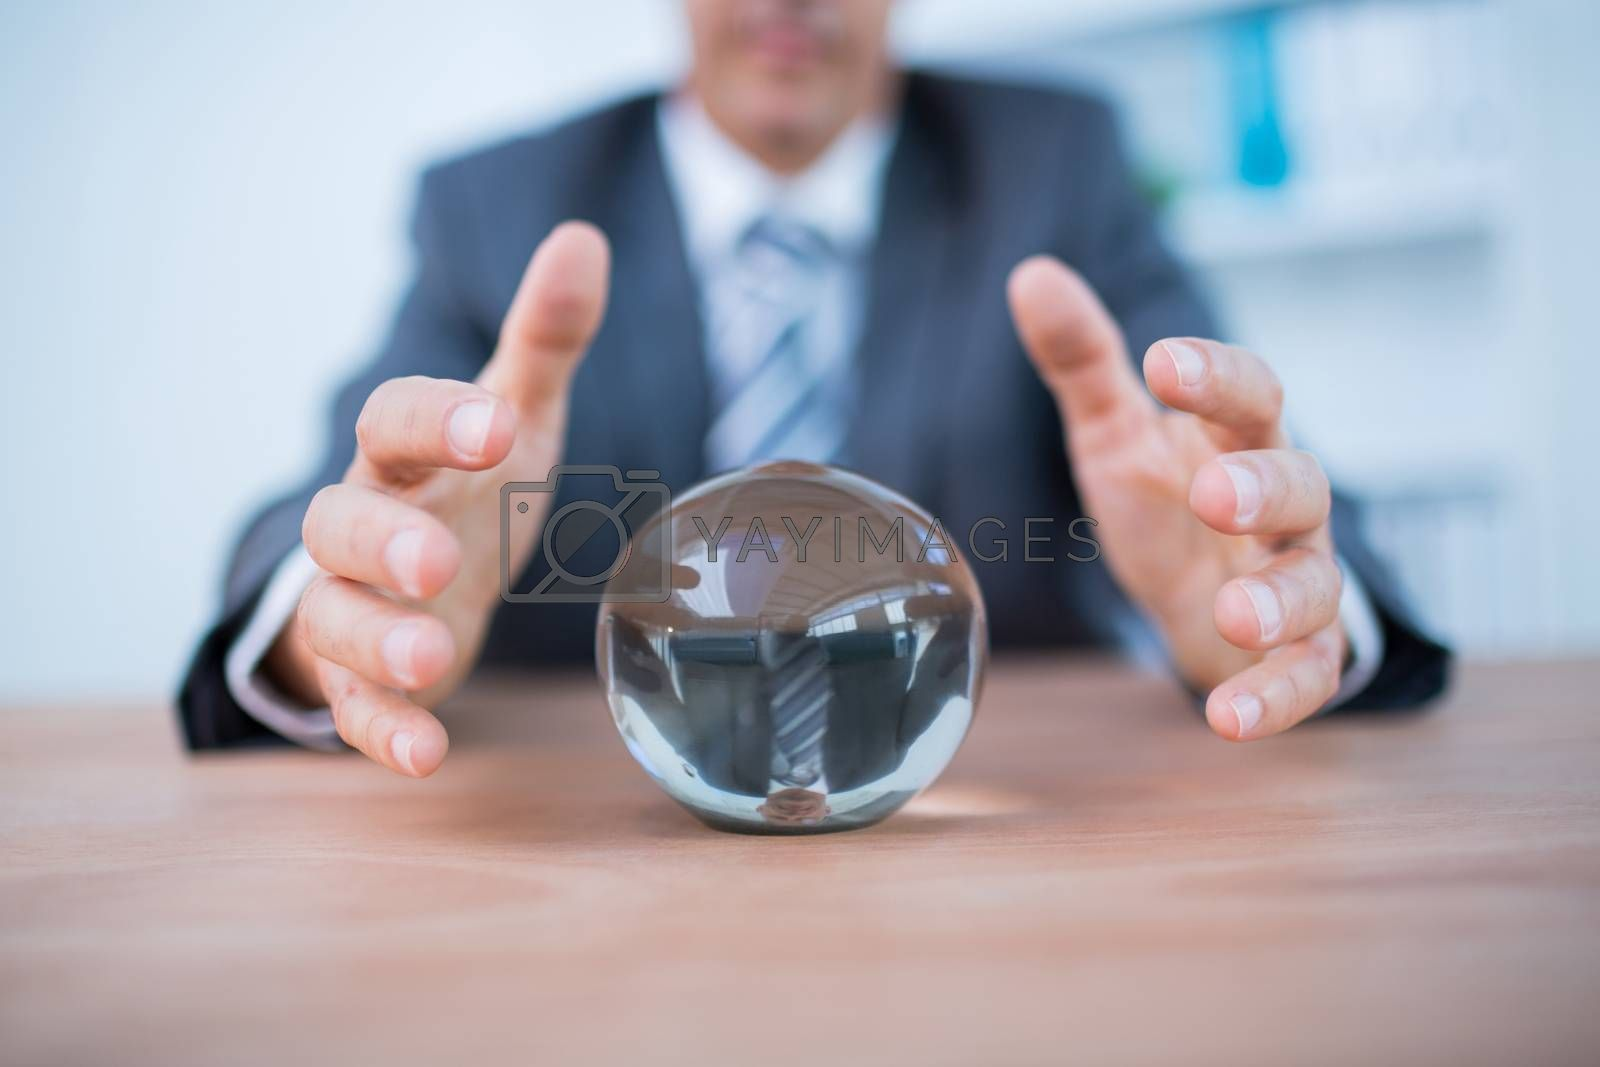 Royalty free image of Businessman forecasting a crystal ball by Wavebreakmedia